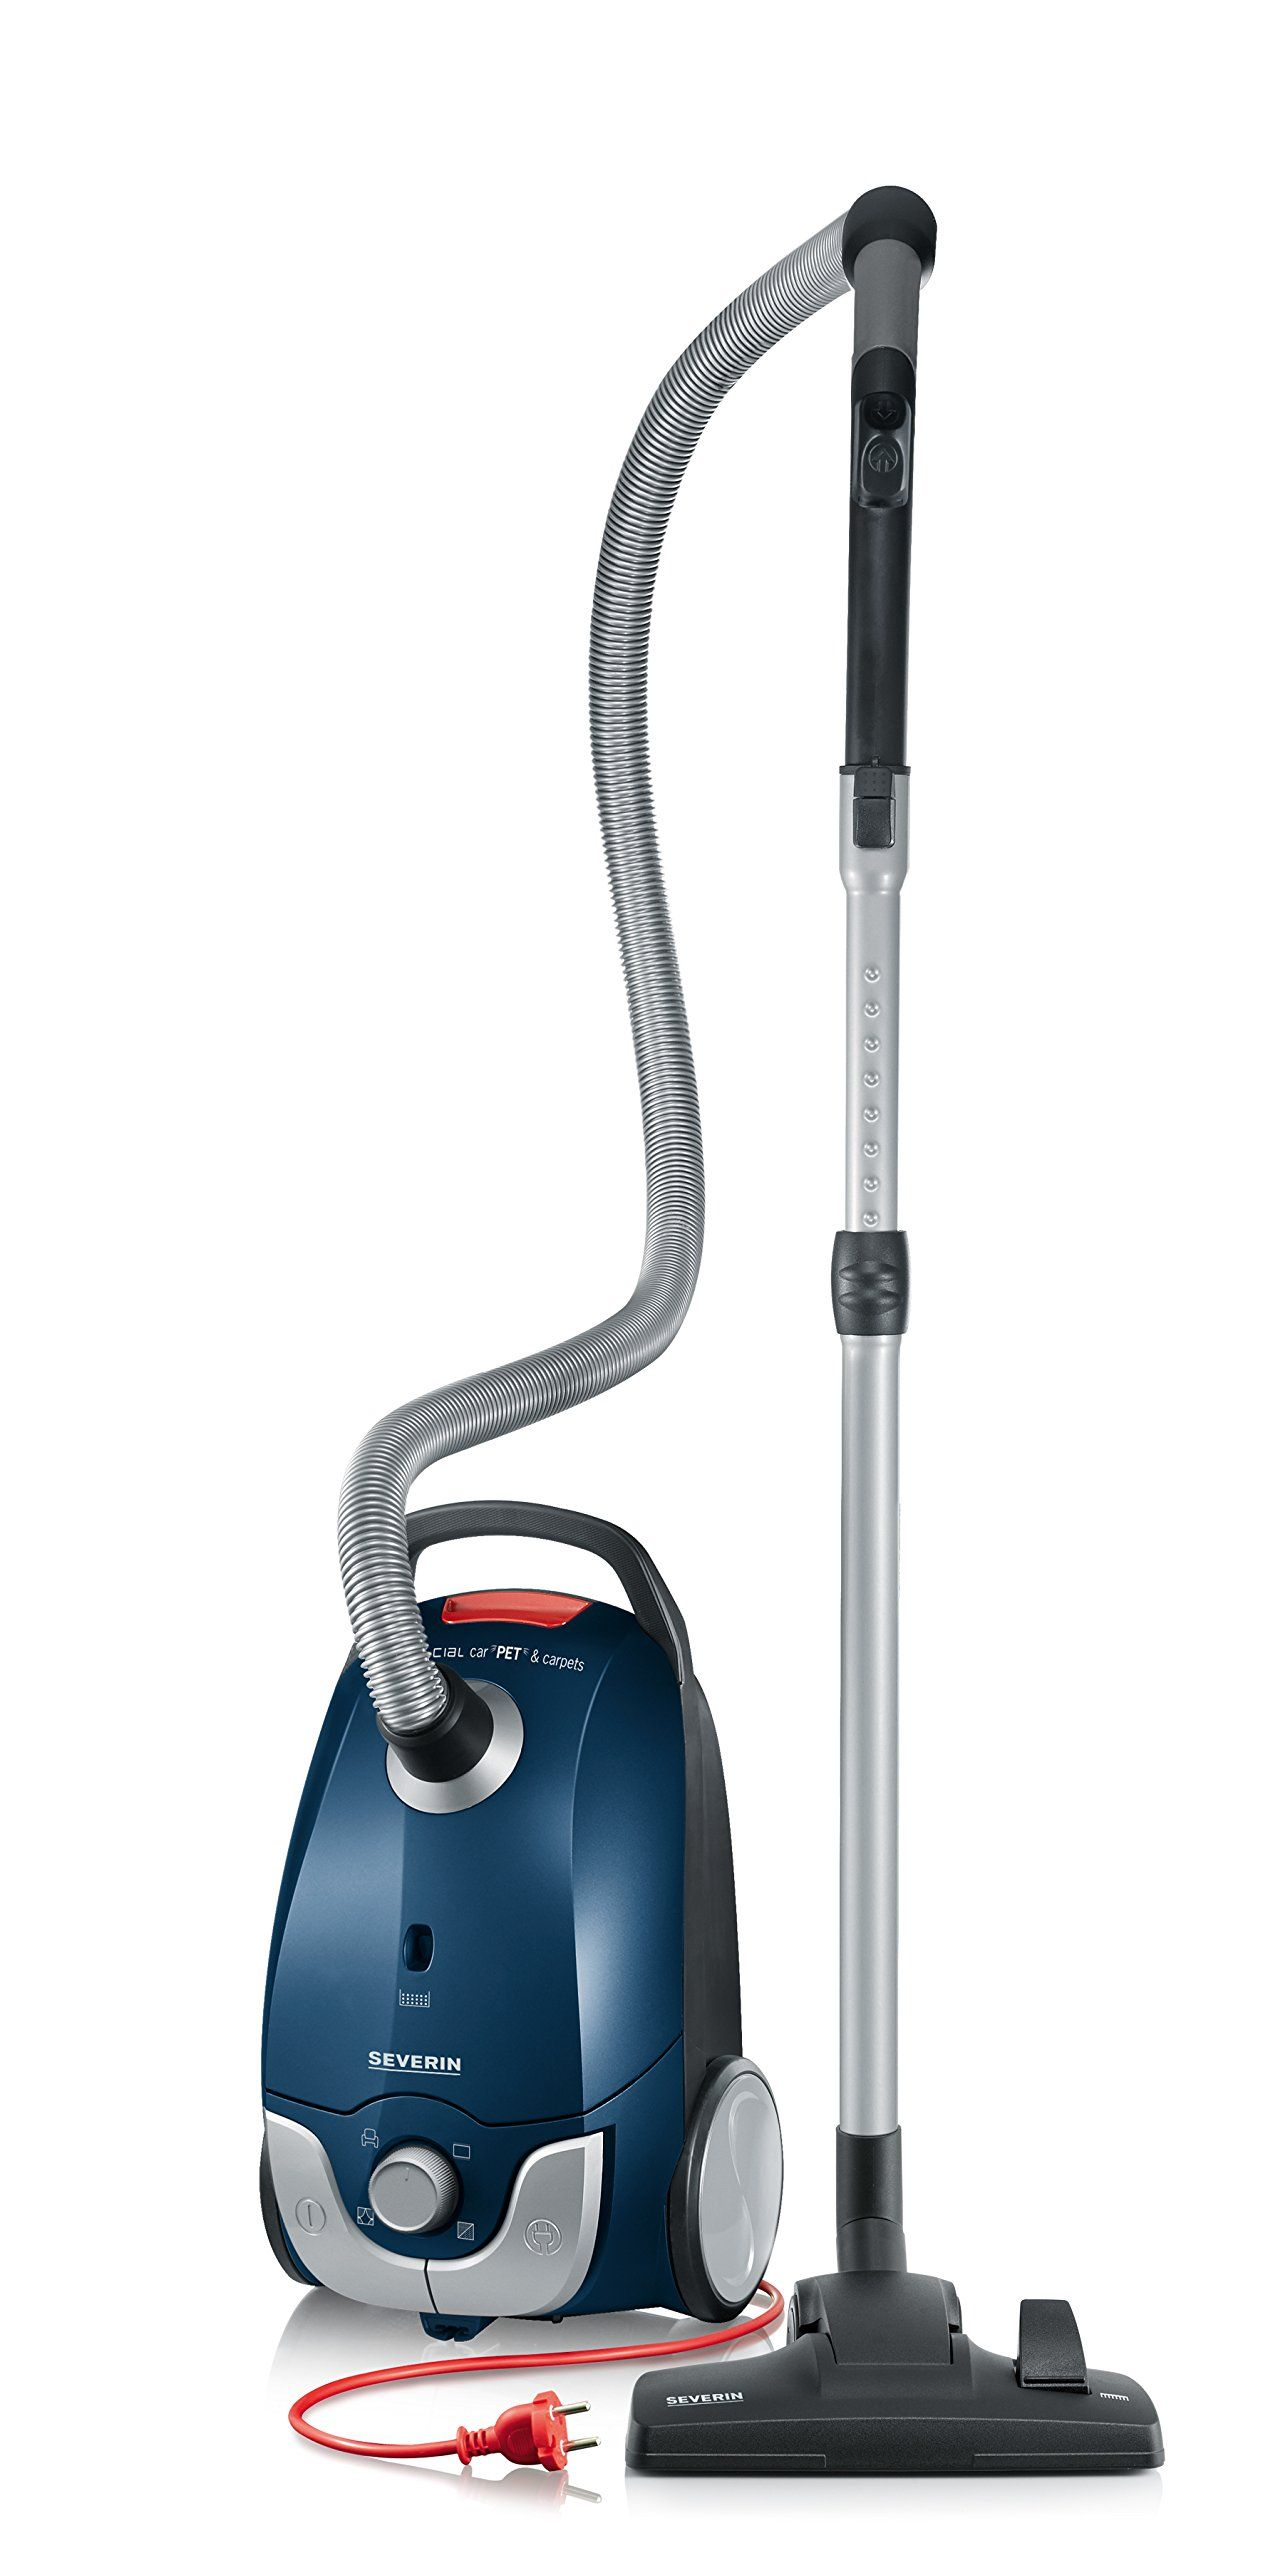 Severin Germany Special Vacuum Cleaner Corded Ocean Blue